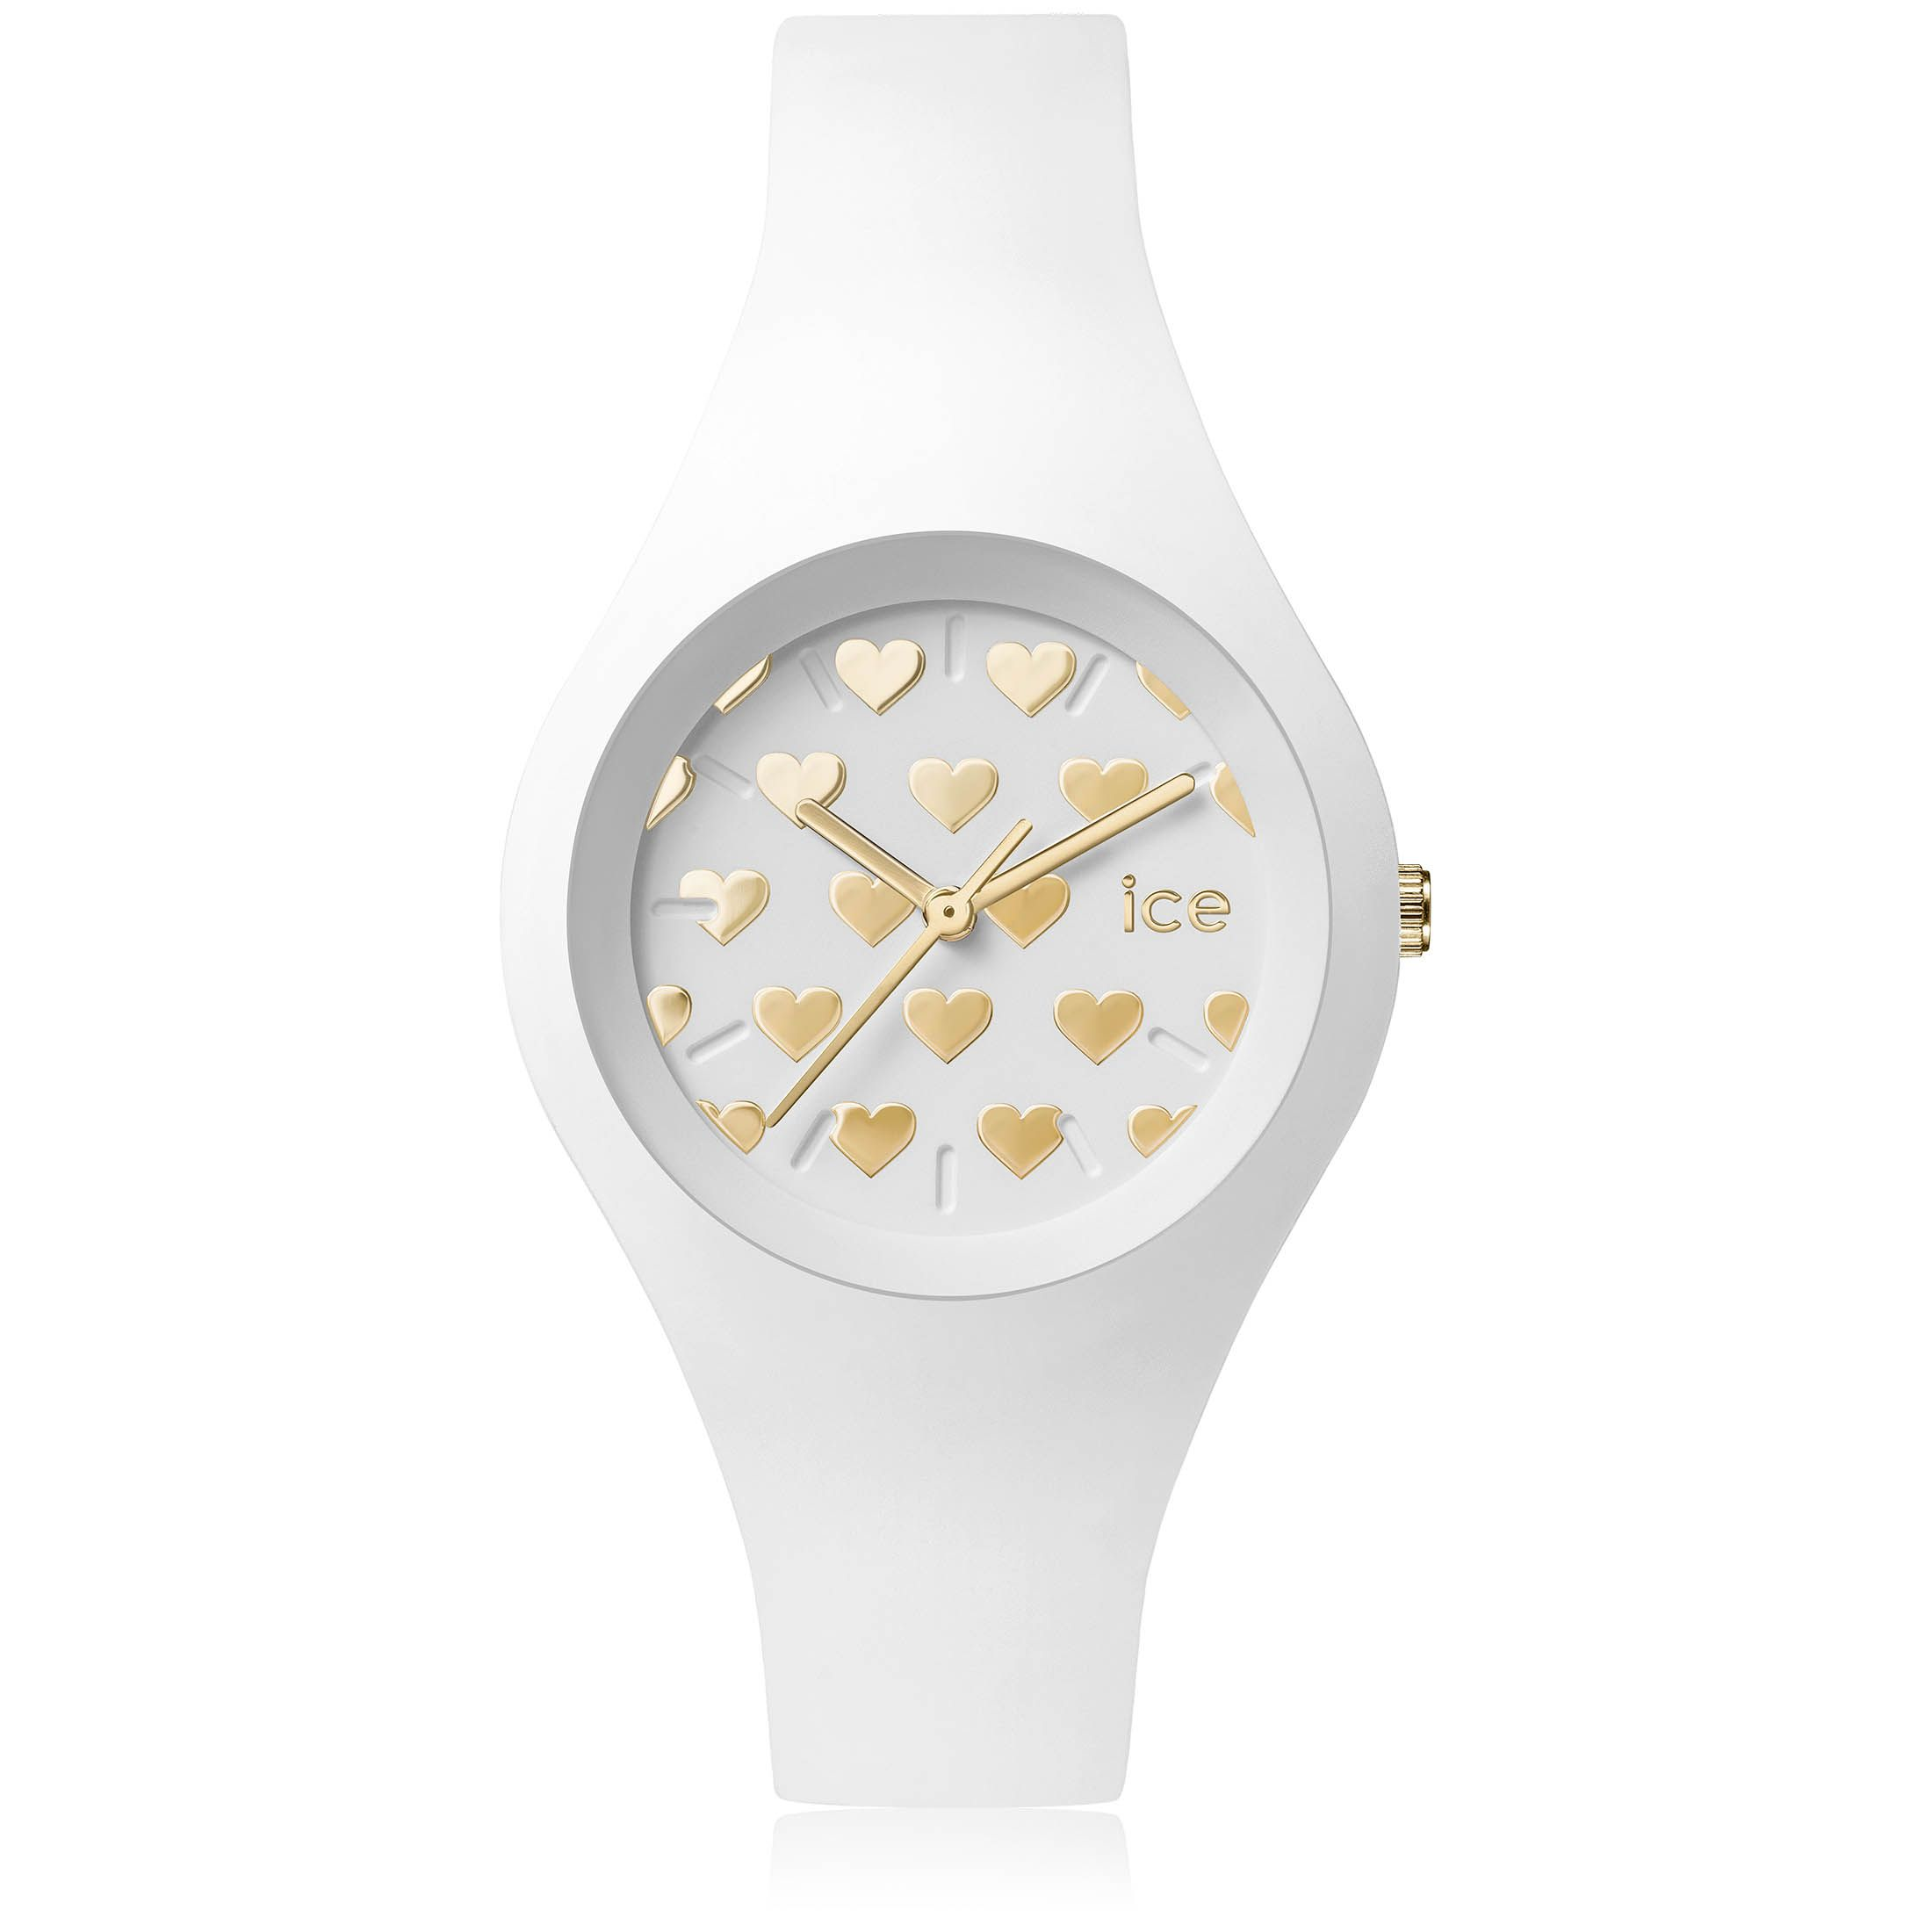 34c98ffe7fe197 Ice Watch Blanche et Dorée Petits coeurs !   Women s Watches in 2019 ...